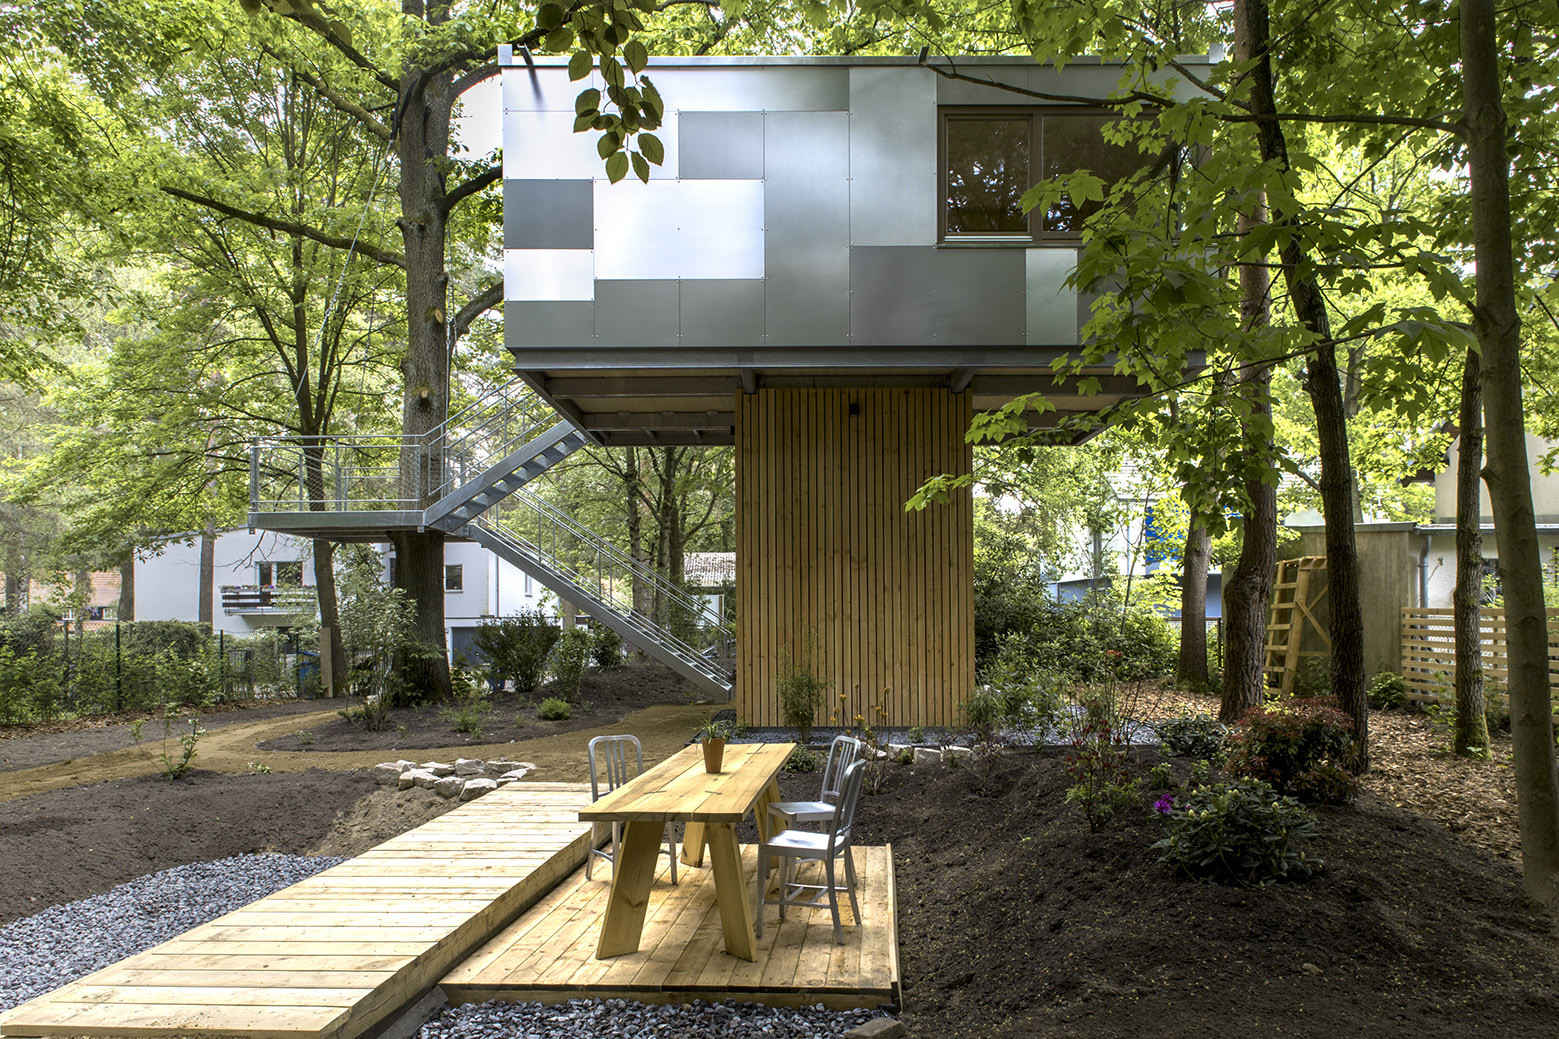 Gallery of Urban Treehouse baumraum 5